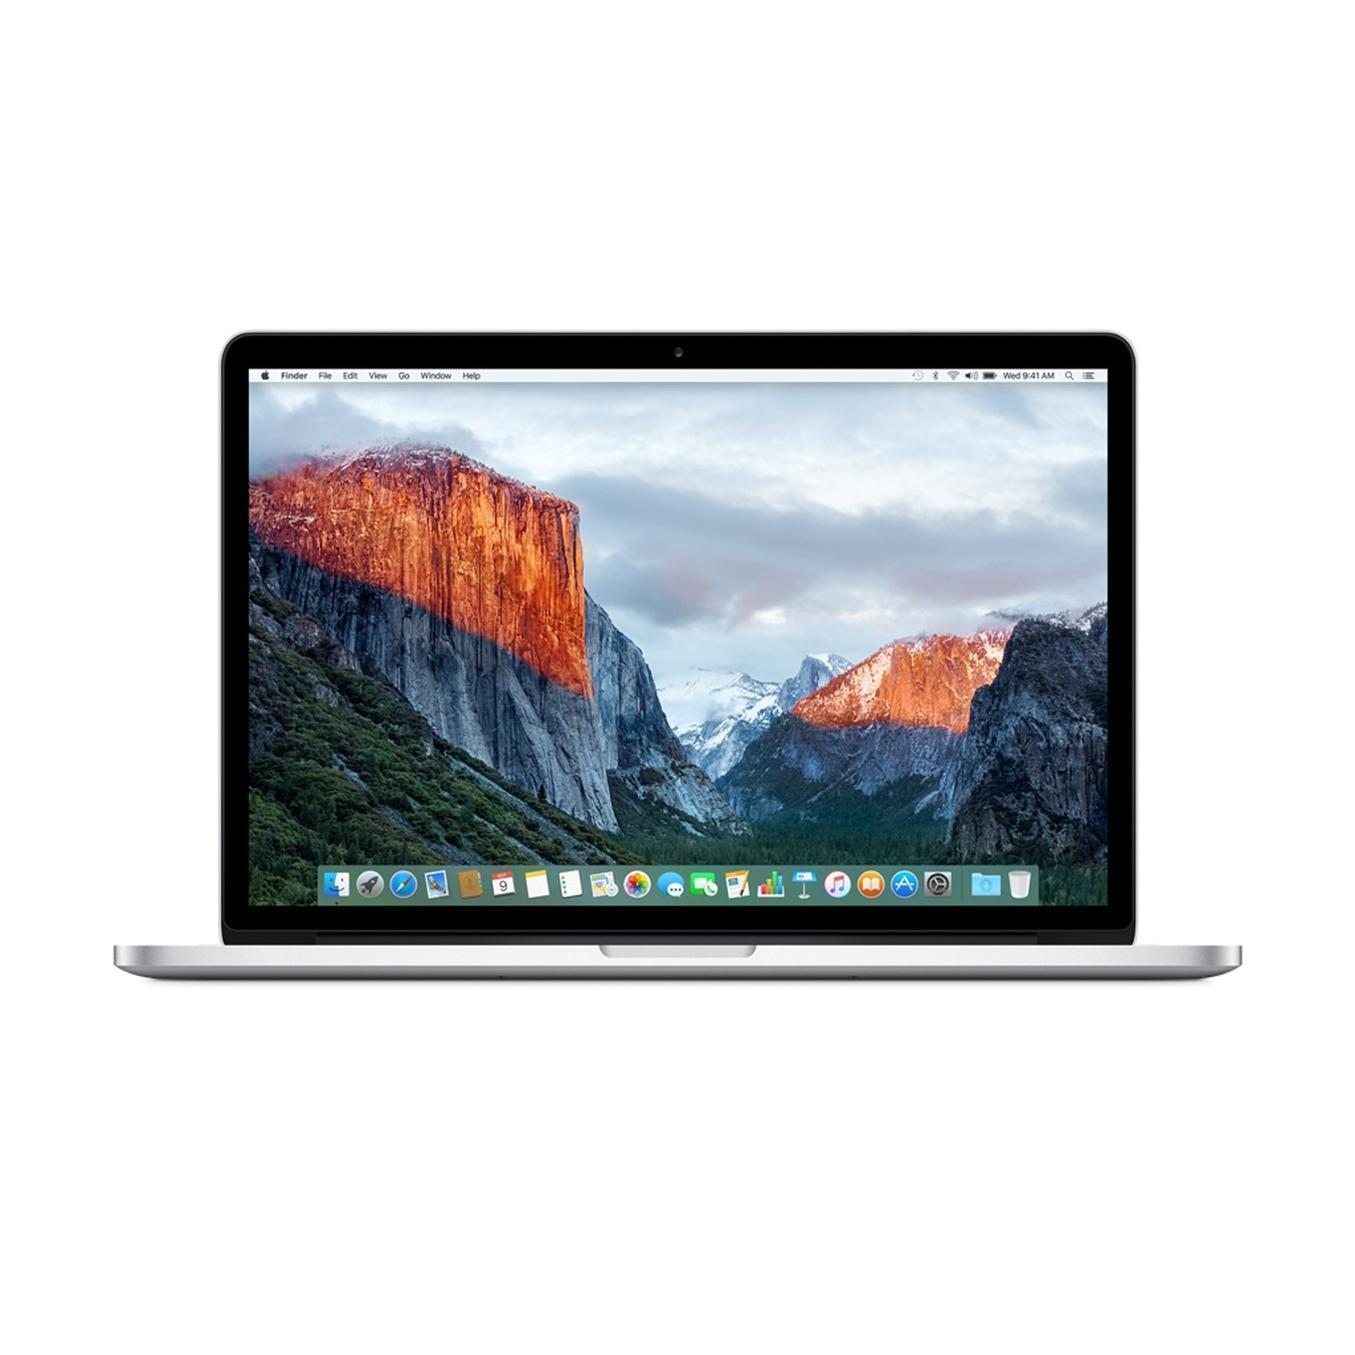 MacBook Pro Retina 15.4-inch (2013) - Core i7 - 8GB - SSD 128 GB QWERTY - English (UK)